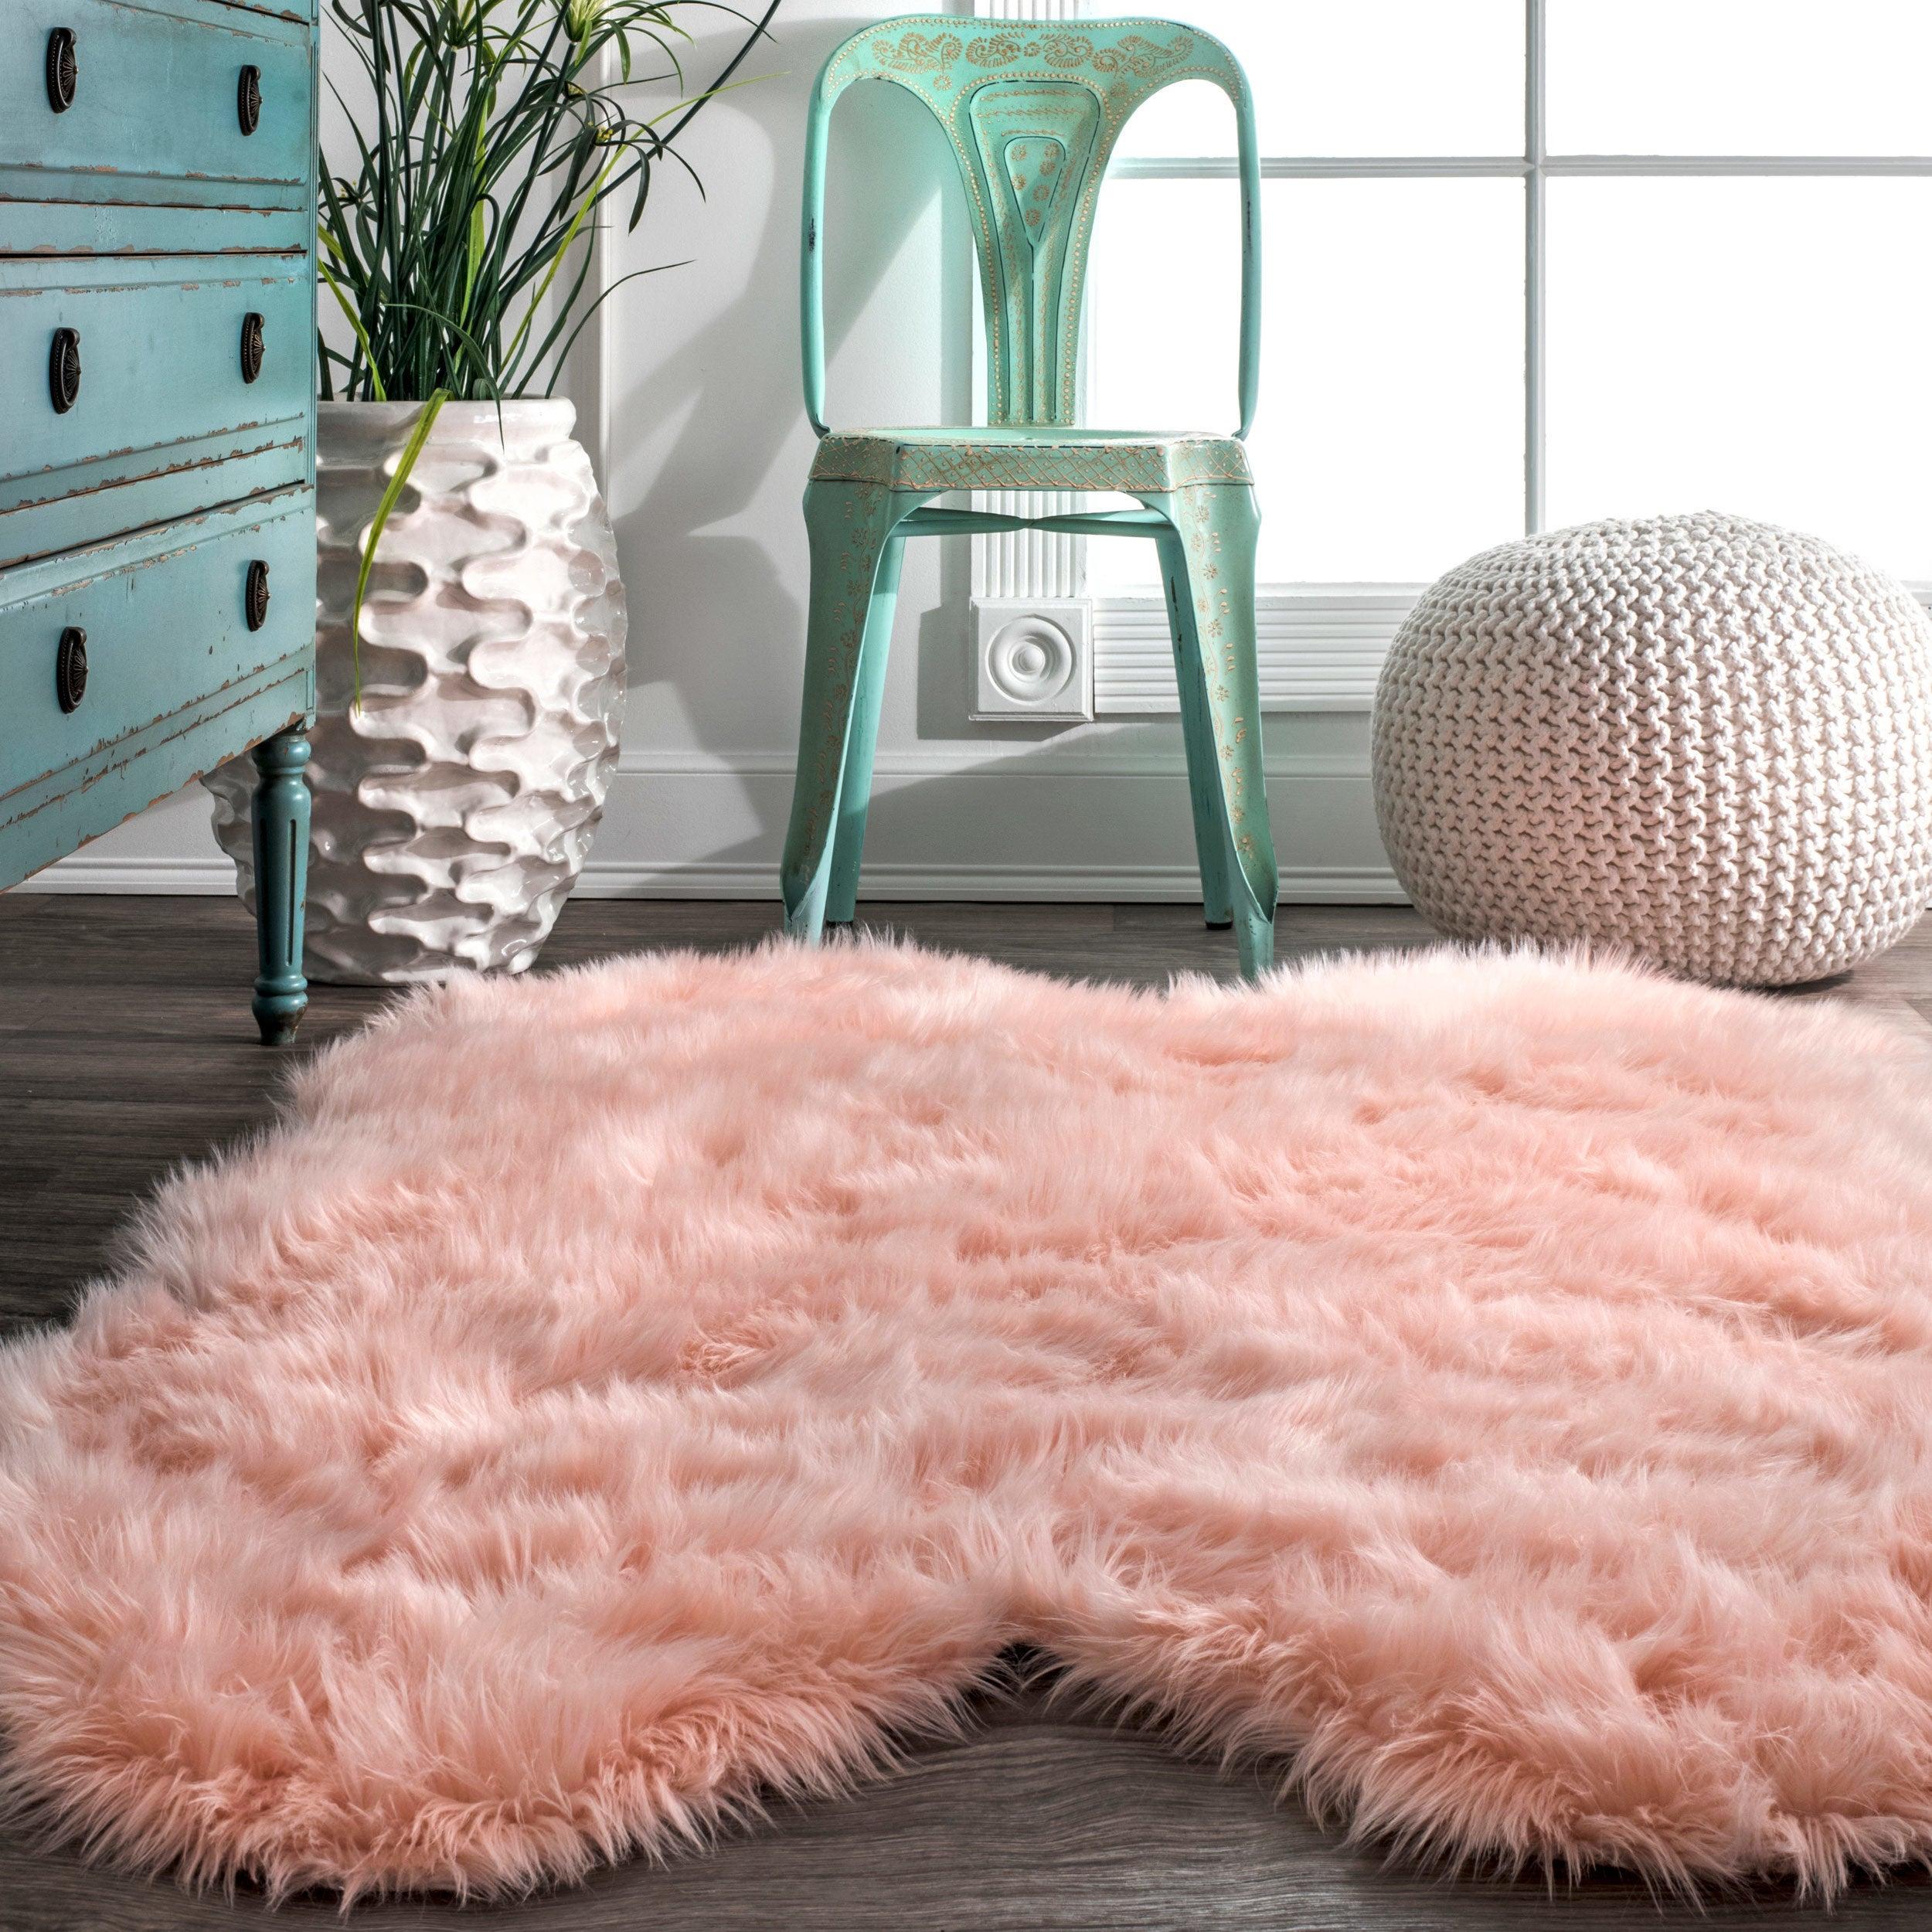 NuLOOM Faux Flokati Sheepskin Soft And Plush Cloud Pink Shag Rug (3u00276 X 6u0027)    Free Shipping Today   Overstock.com   22911356